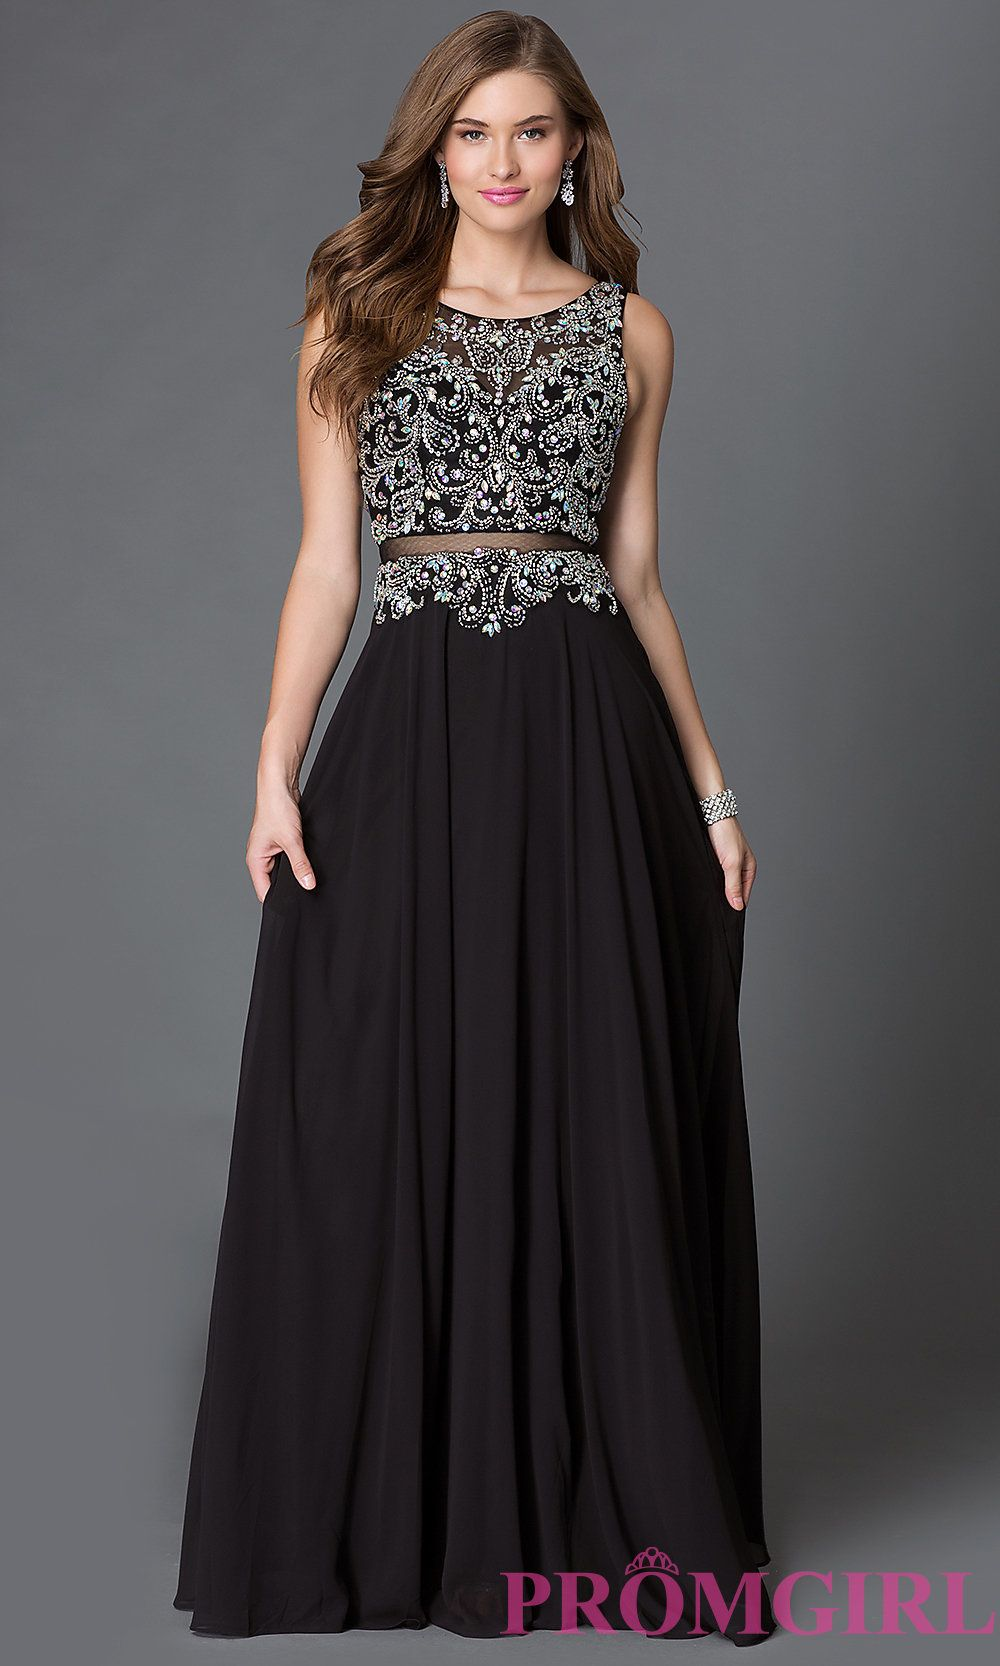 Jeweled cocktail dresses